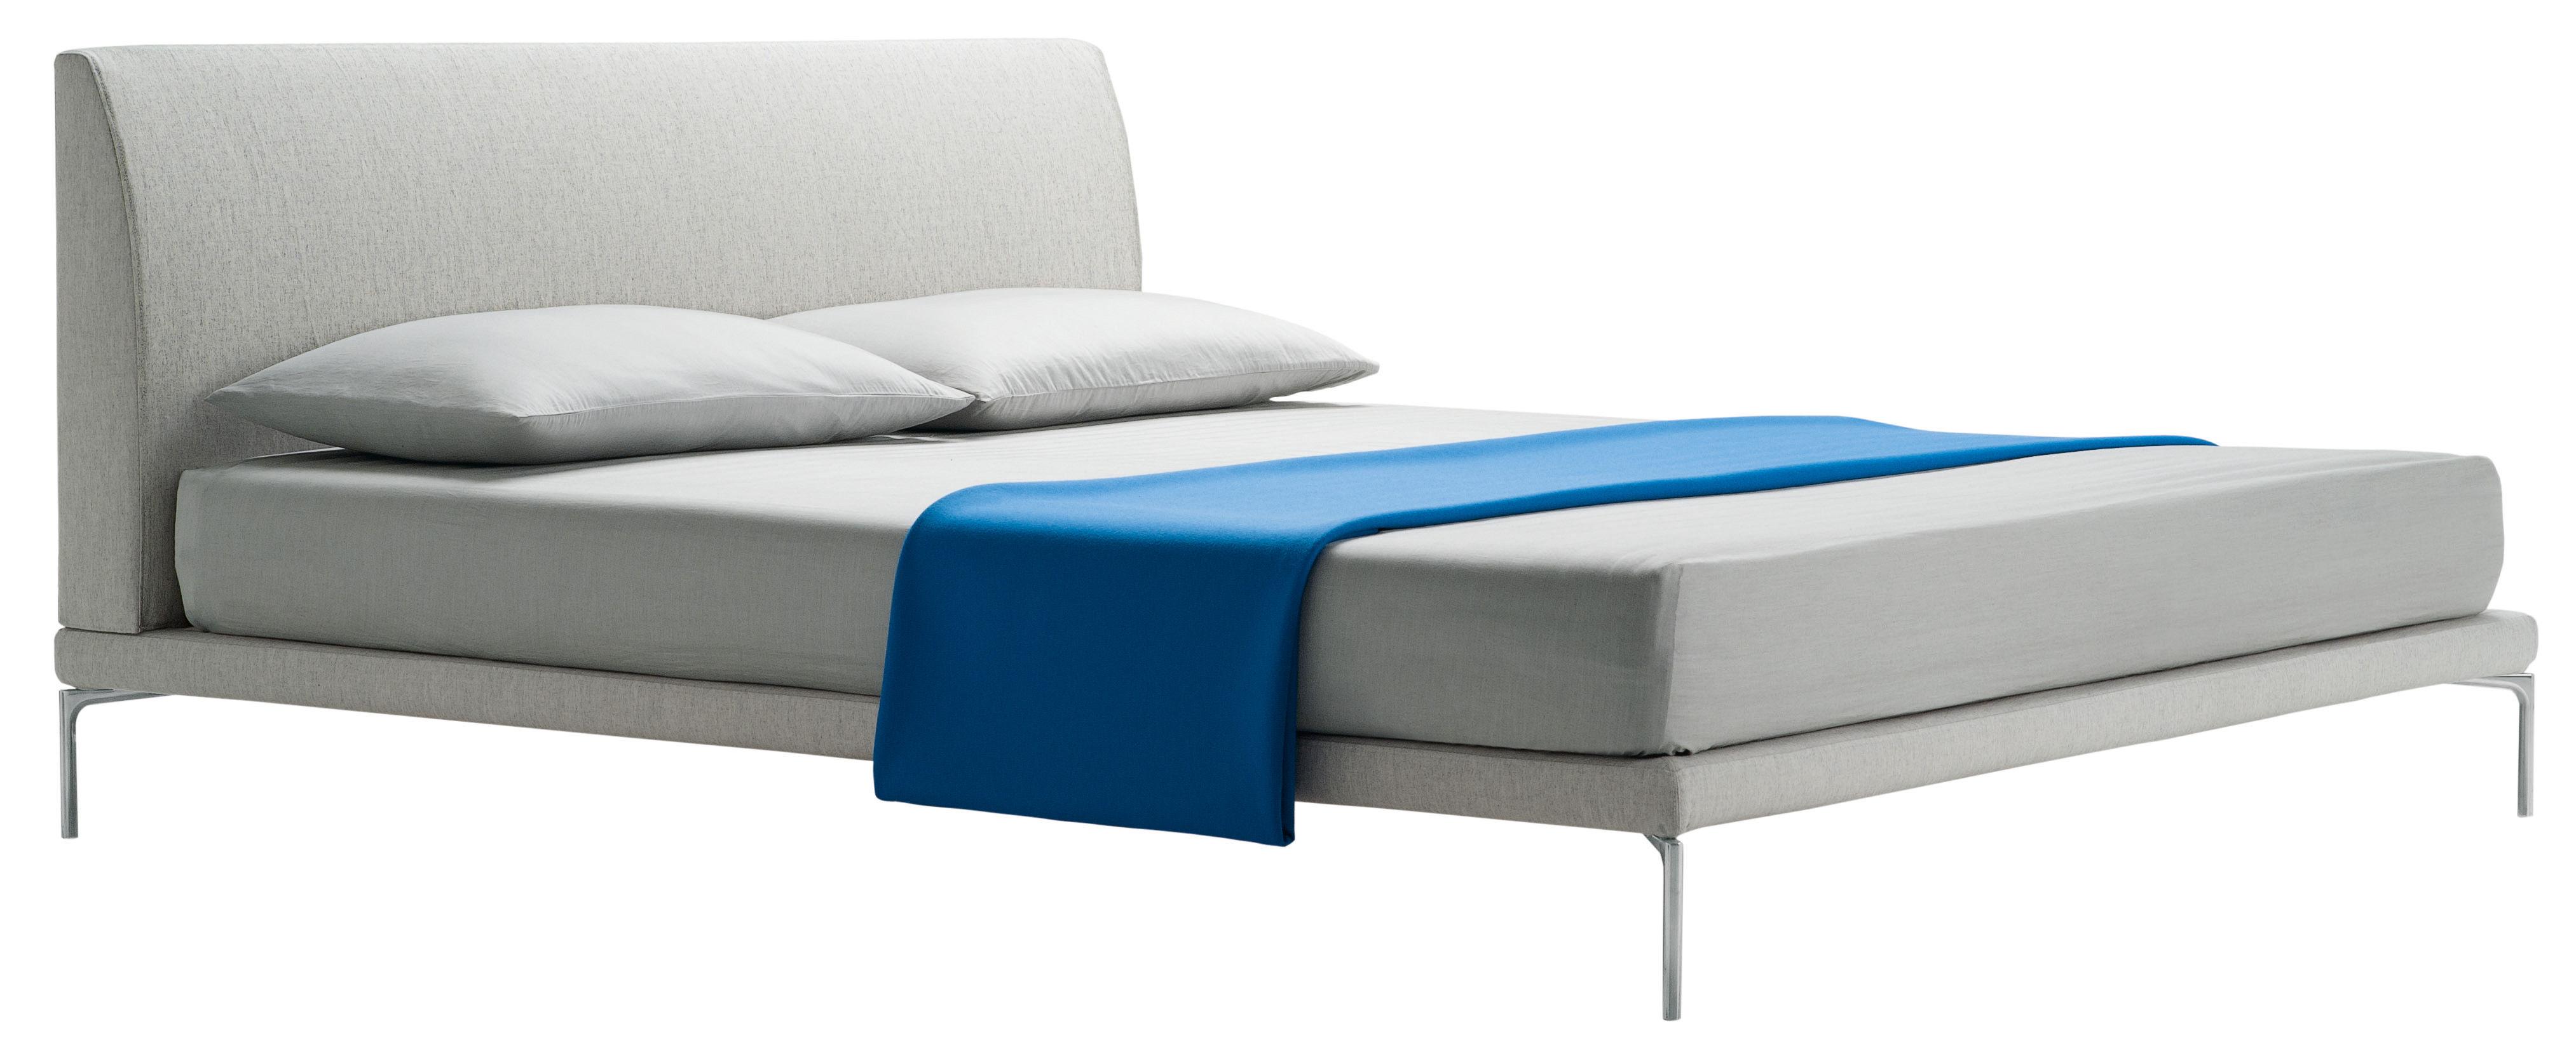 Möbel - Betten - Talamo Doppelbett / 166 x 216 cm - Zanotta - Natur - Gewebe, Metall